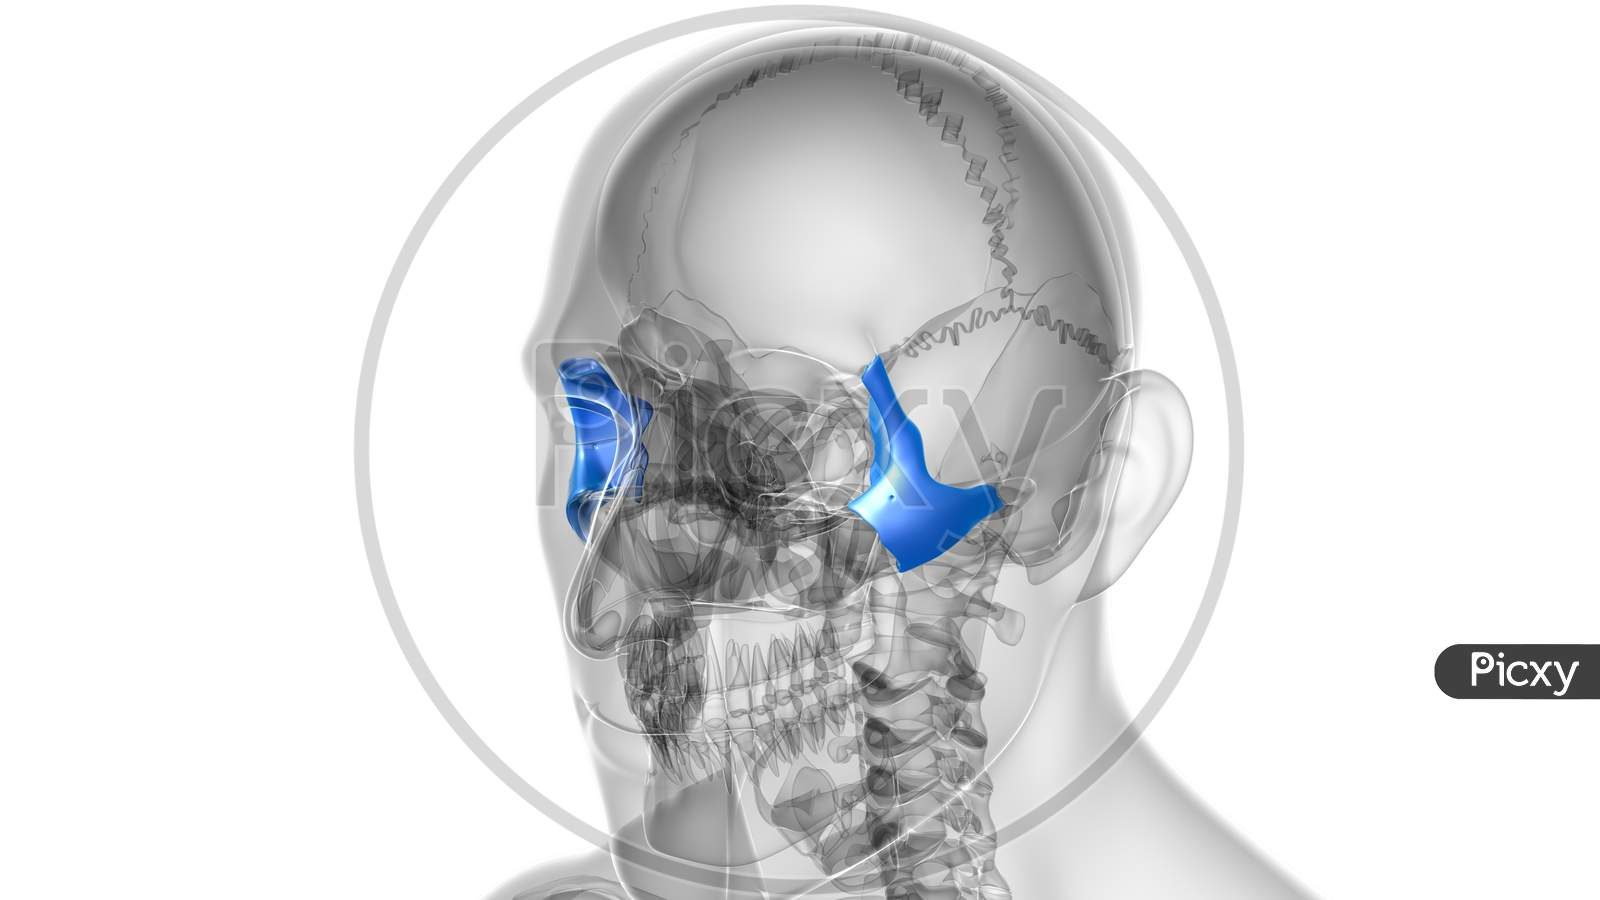 Human Skeleton Skull Zygomatic Bone Anatomy For Medical Concept